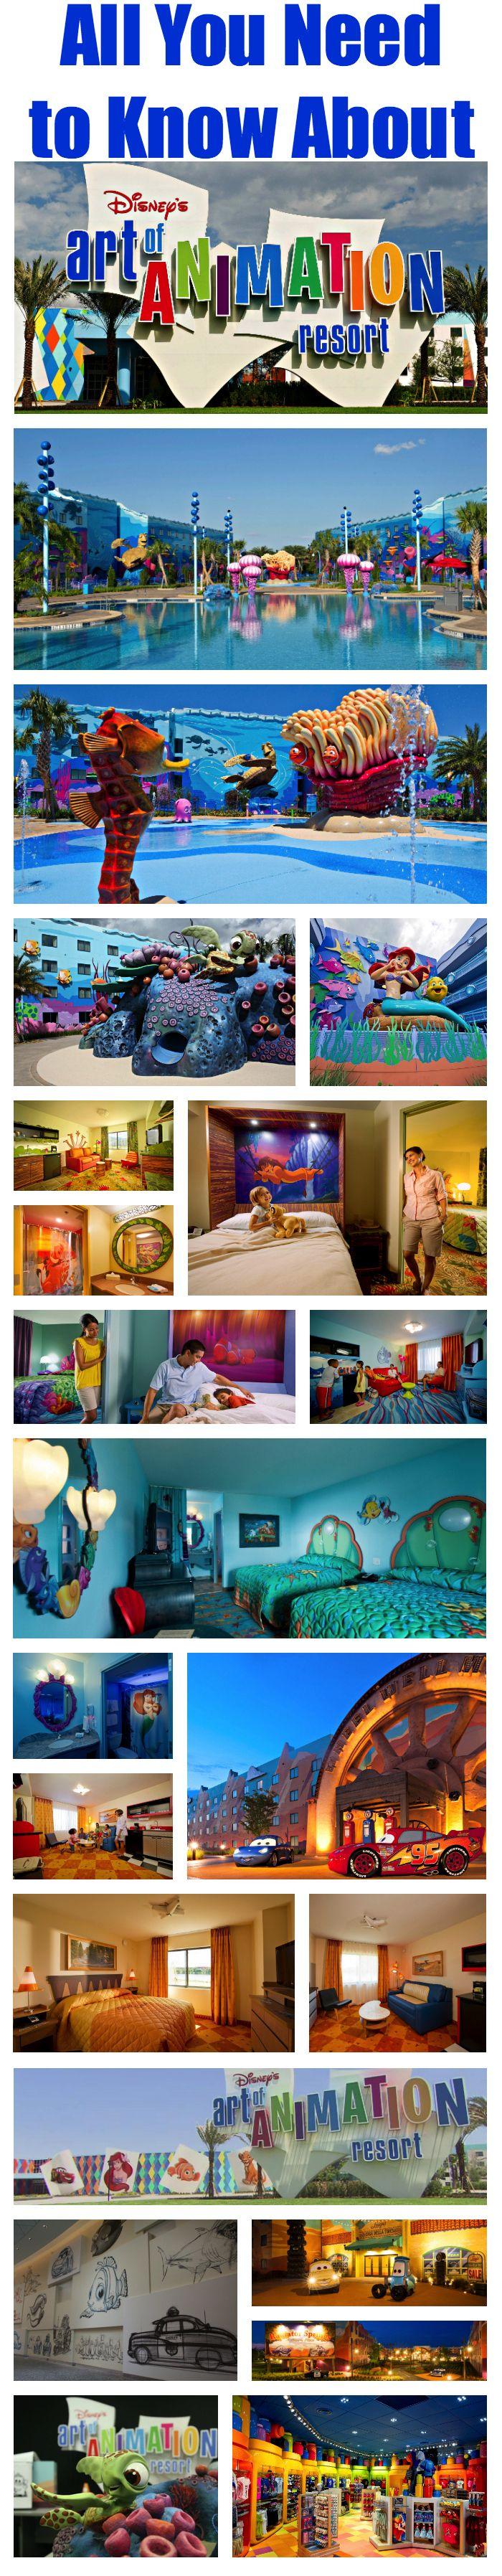 Disney's Art of Animation Resort Collage